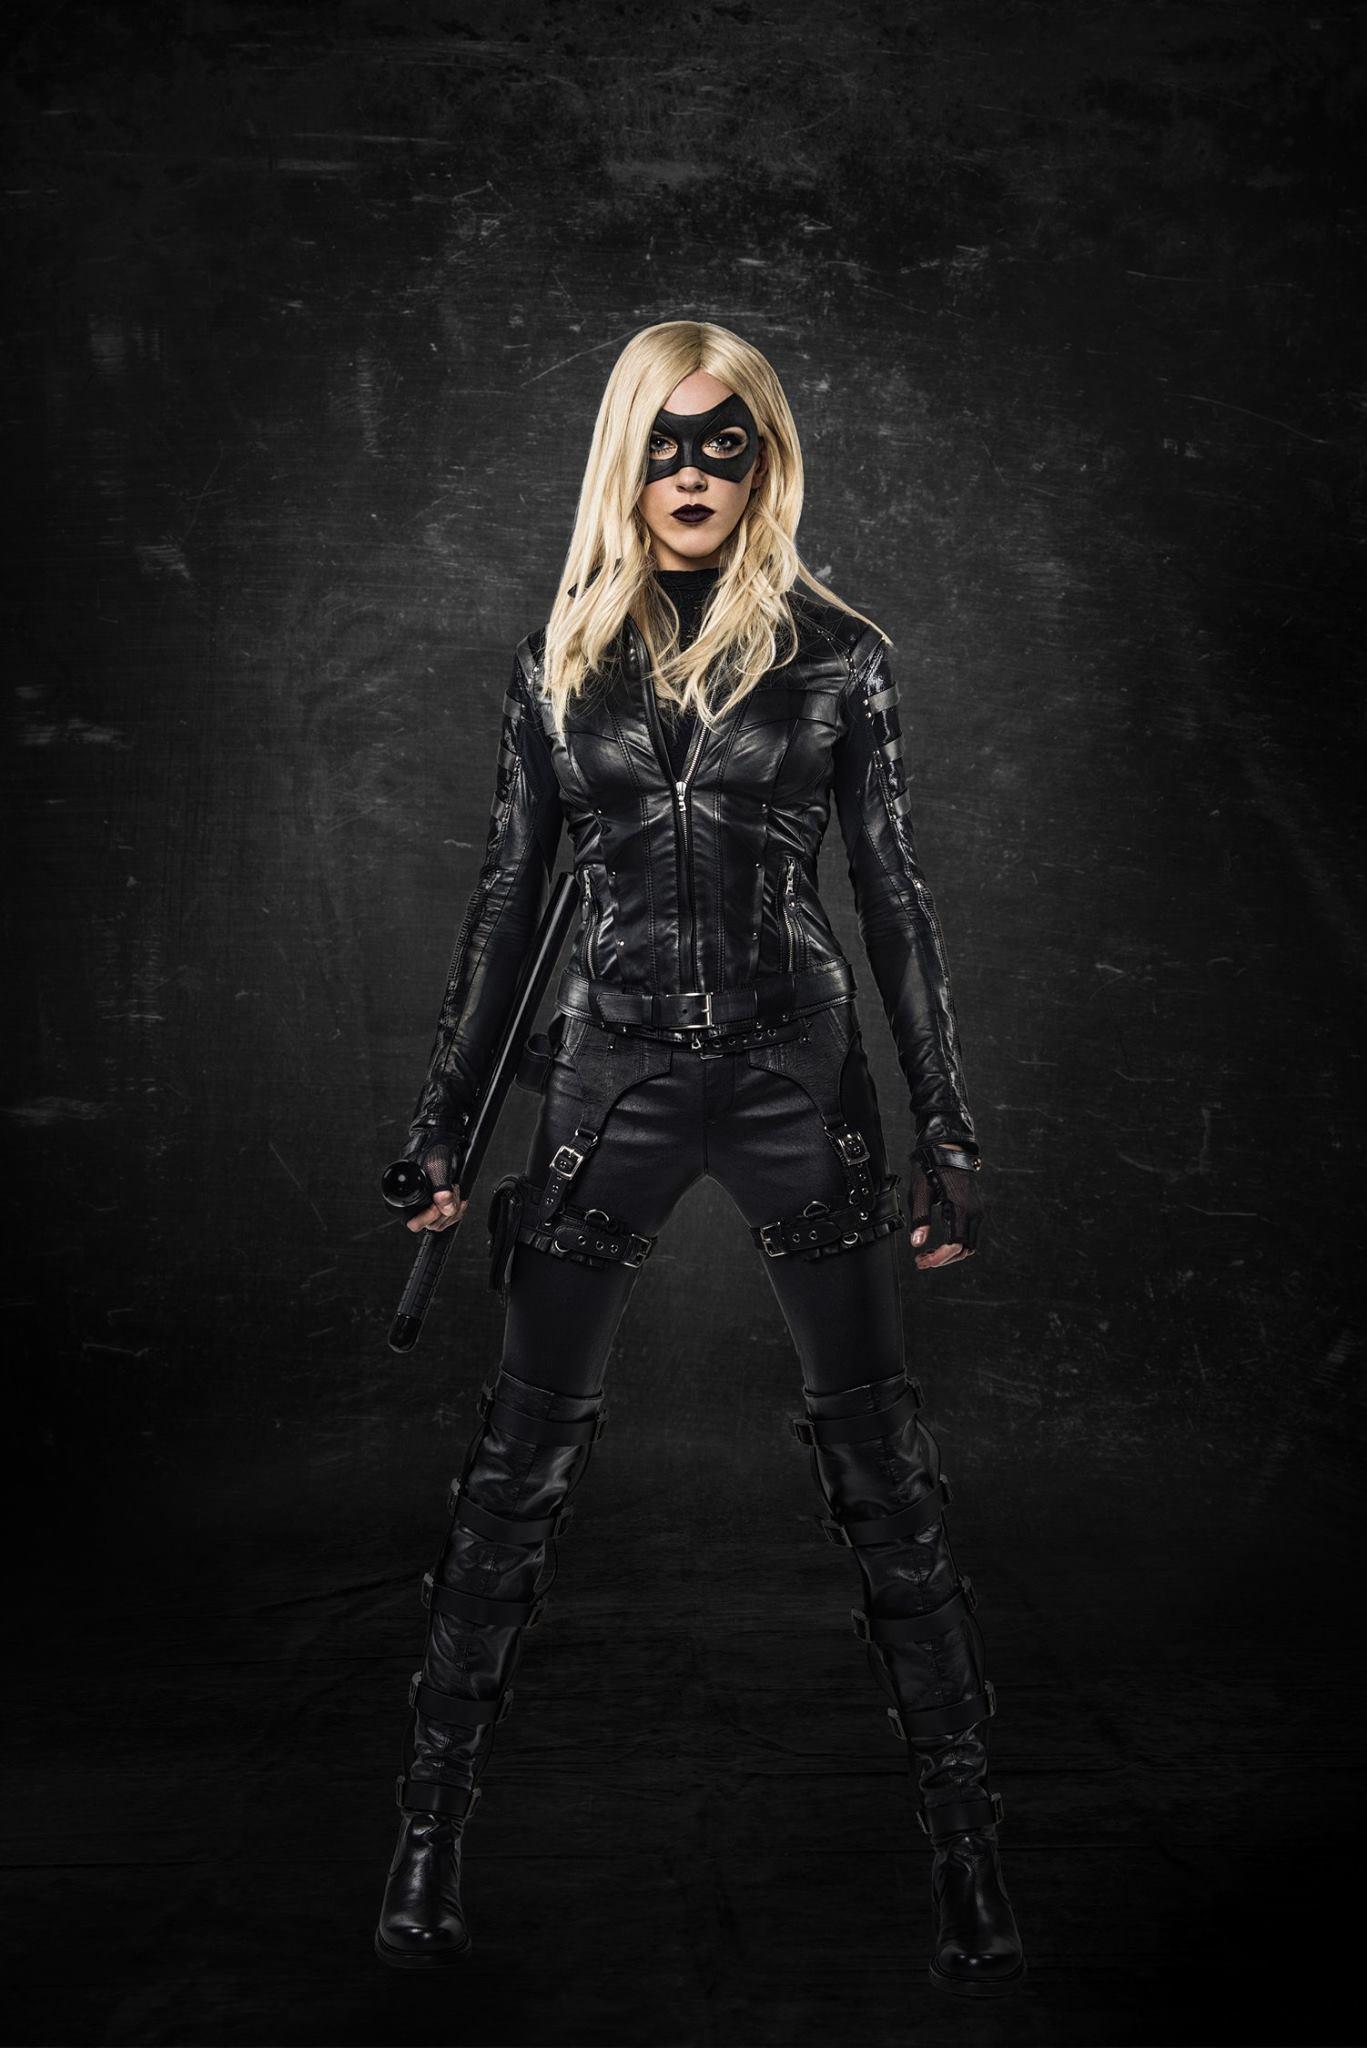 Katie Cassidy Arrow Black Canary Season 3 Promos Gotceleb